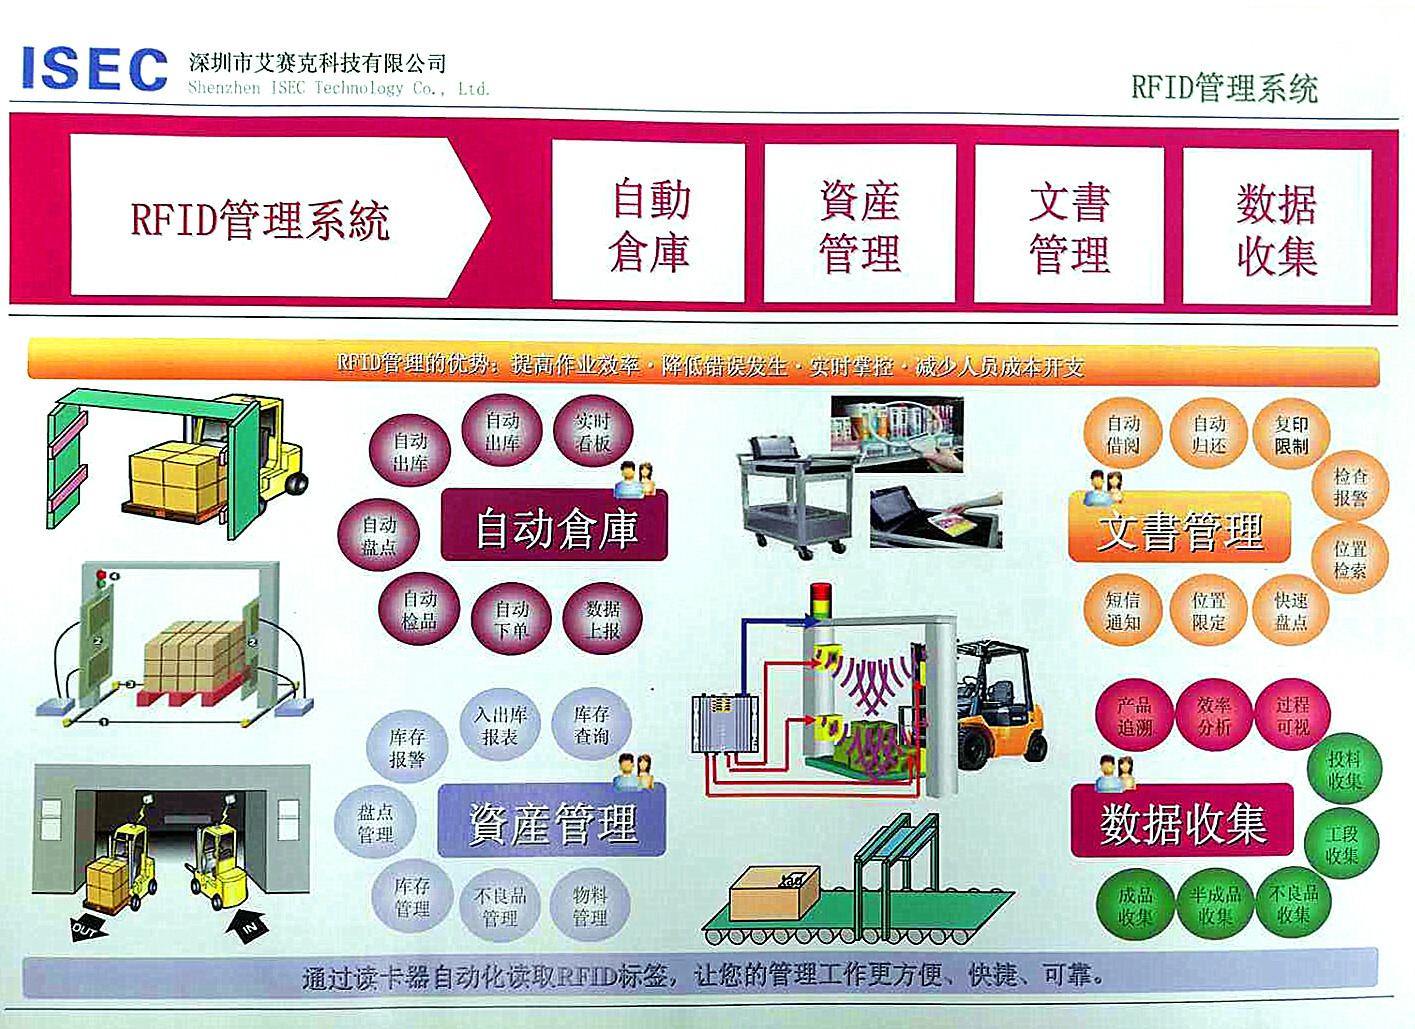 RFID管理系统